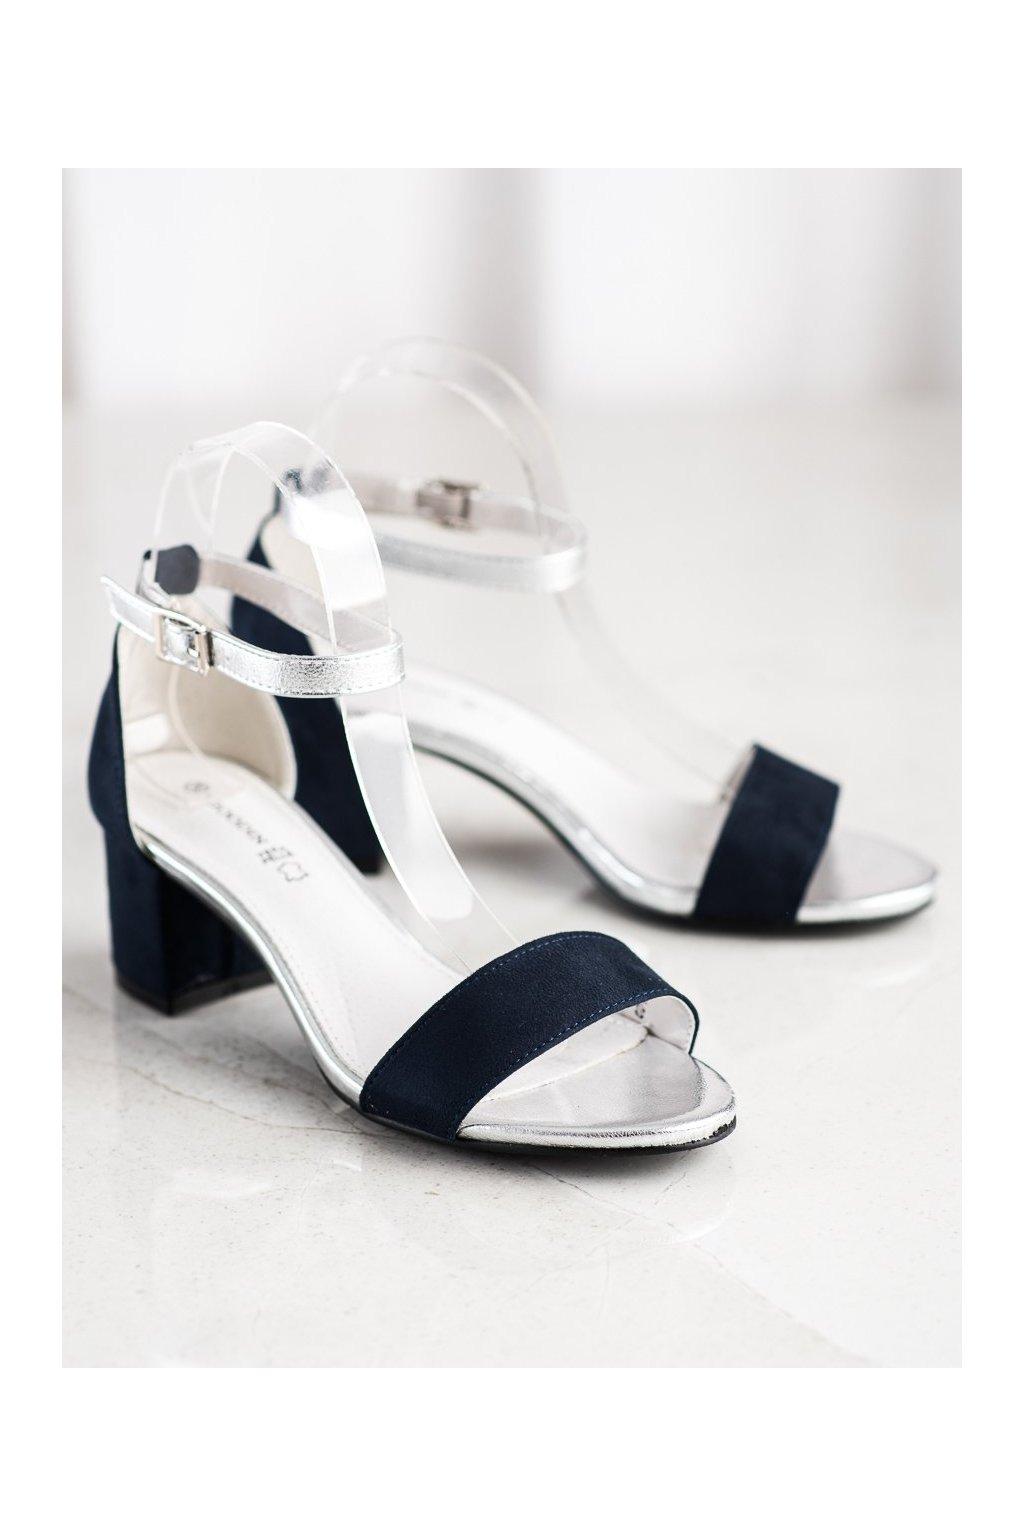 Sivé sandále Goodin kod FL1026N/S